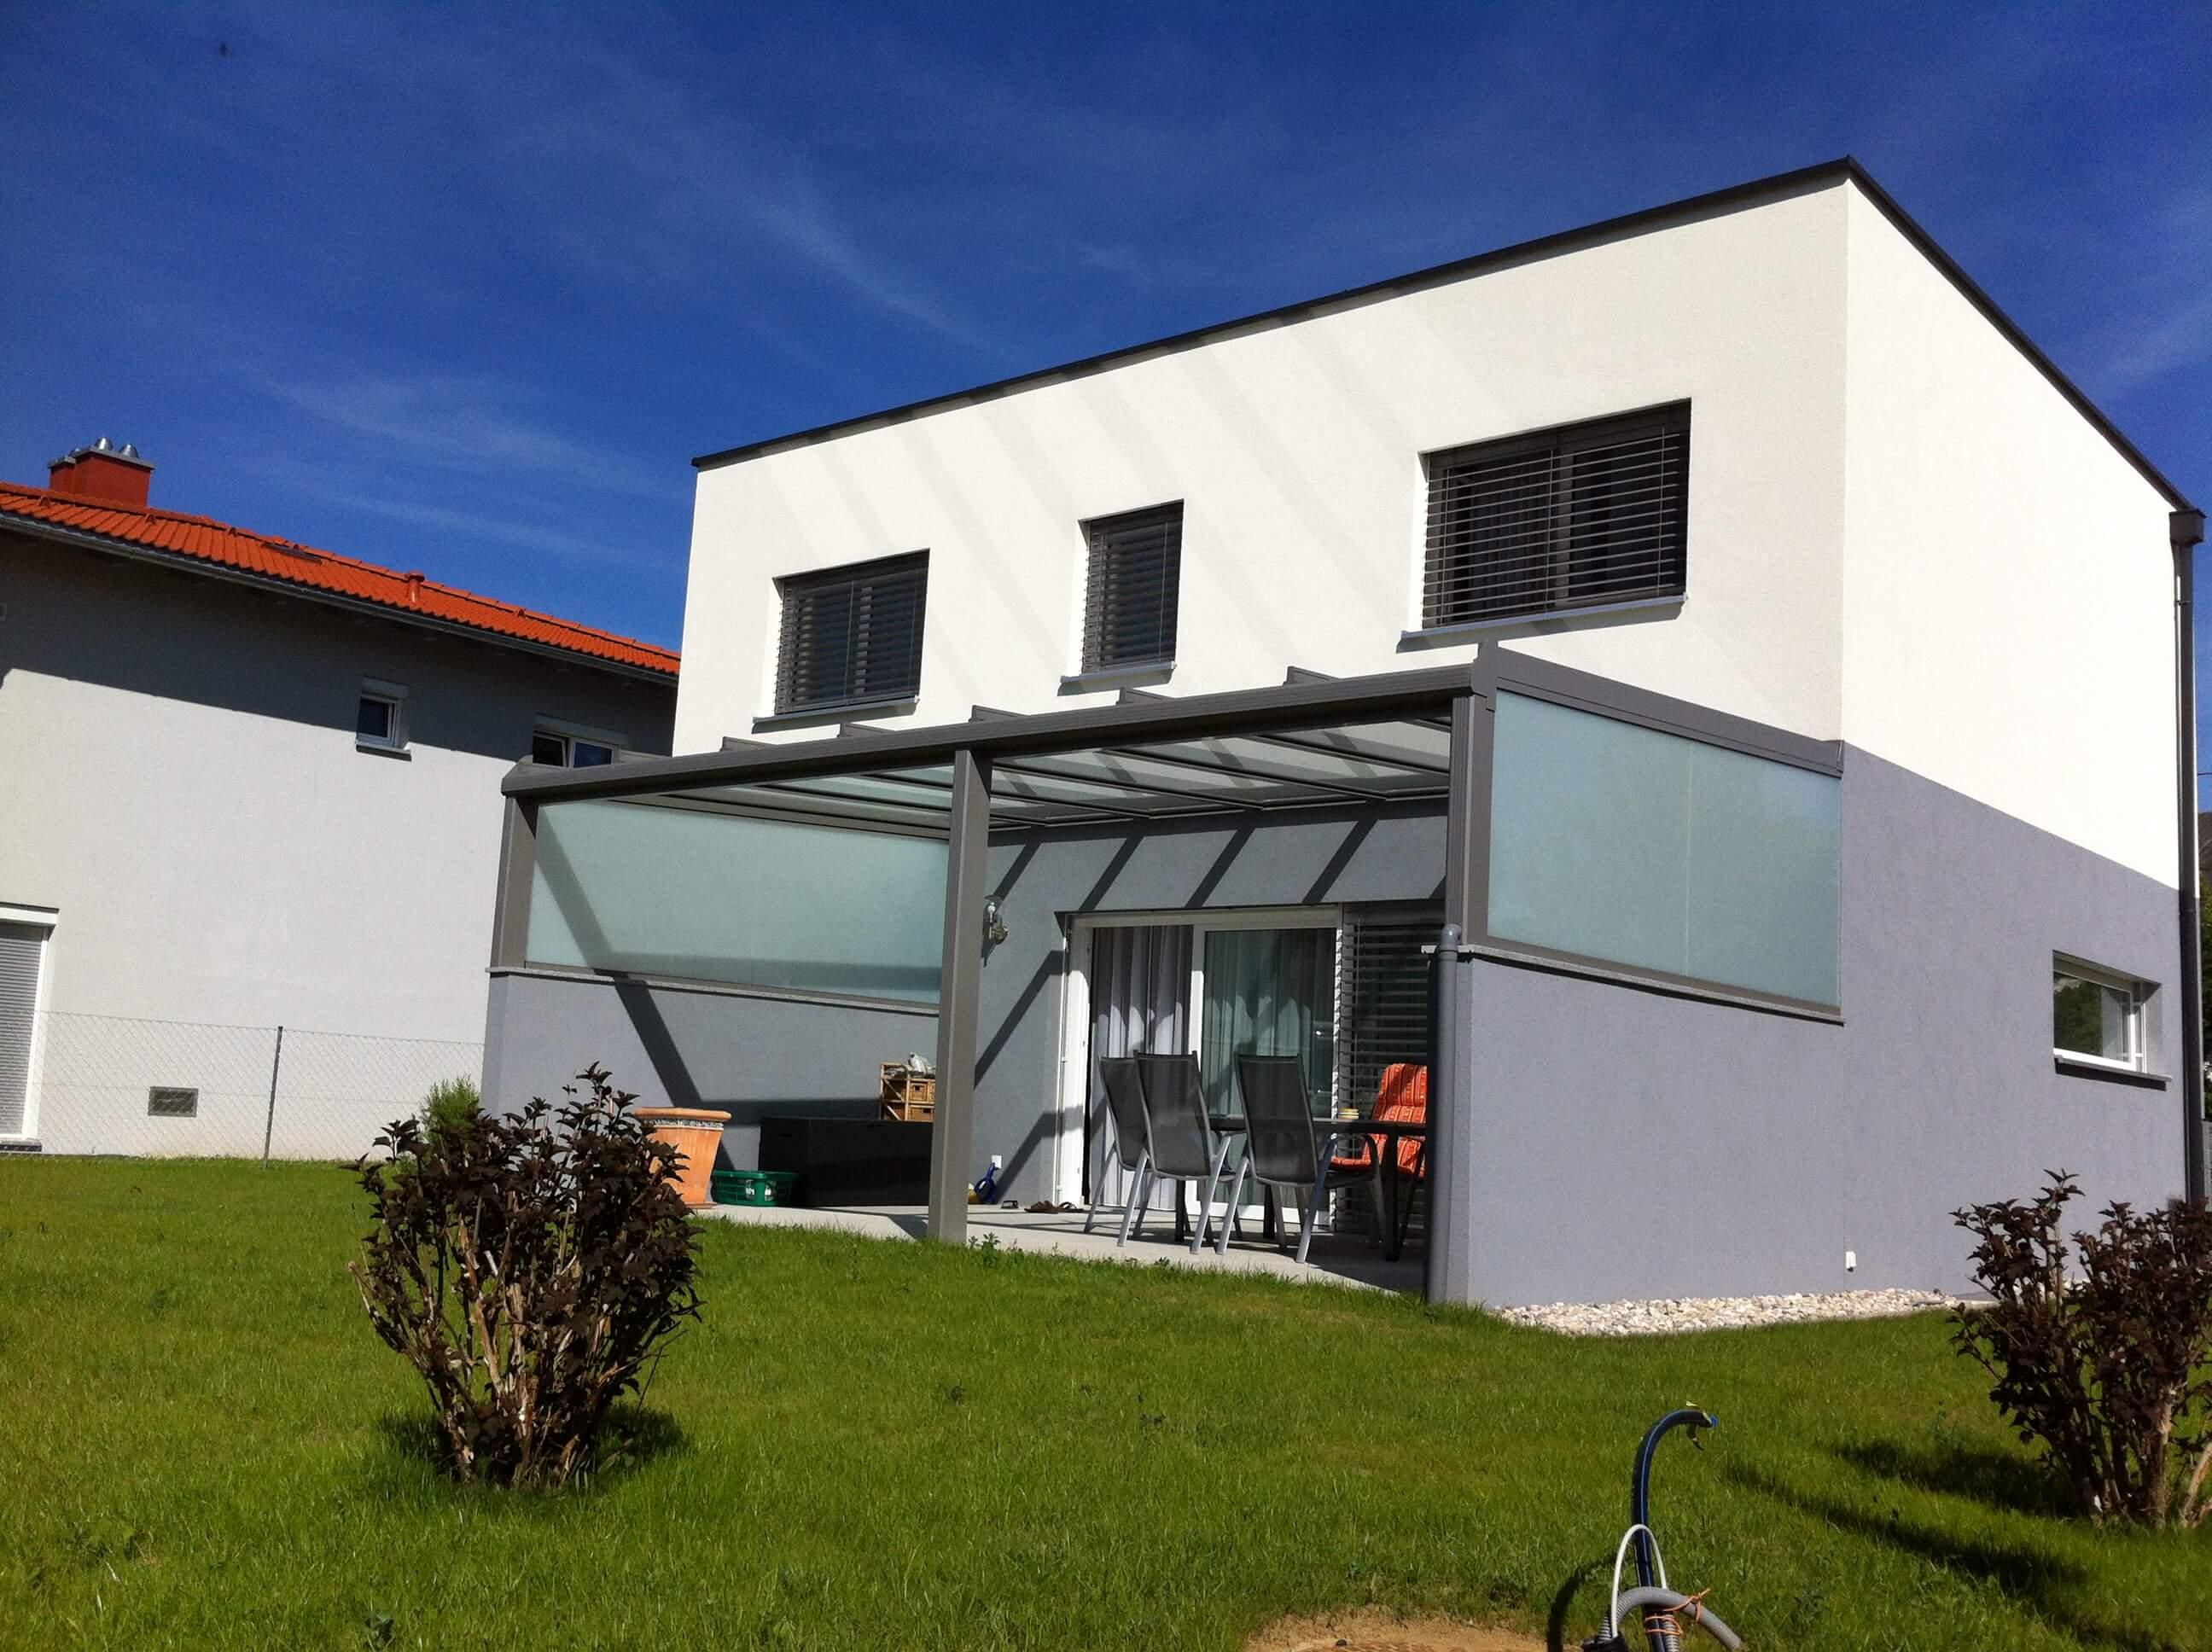 Terrassenüberdachung graualuminium pulverbeschichtet